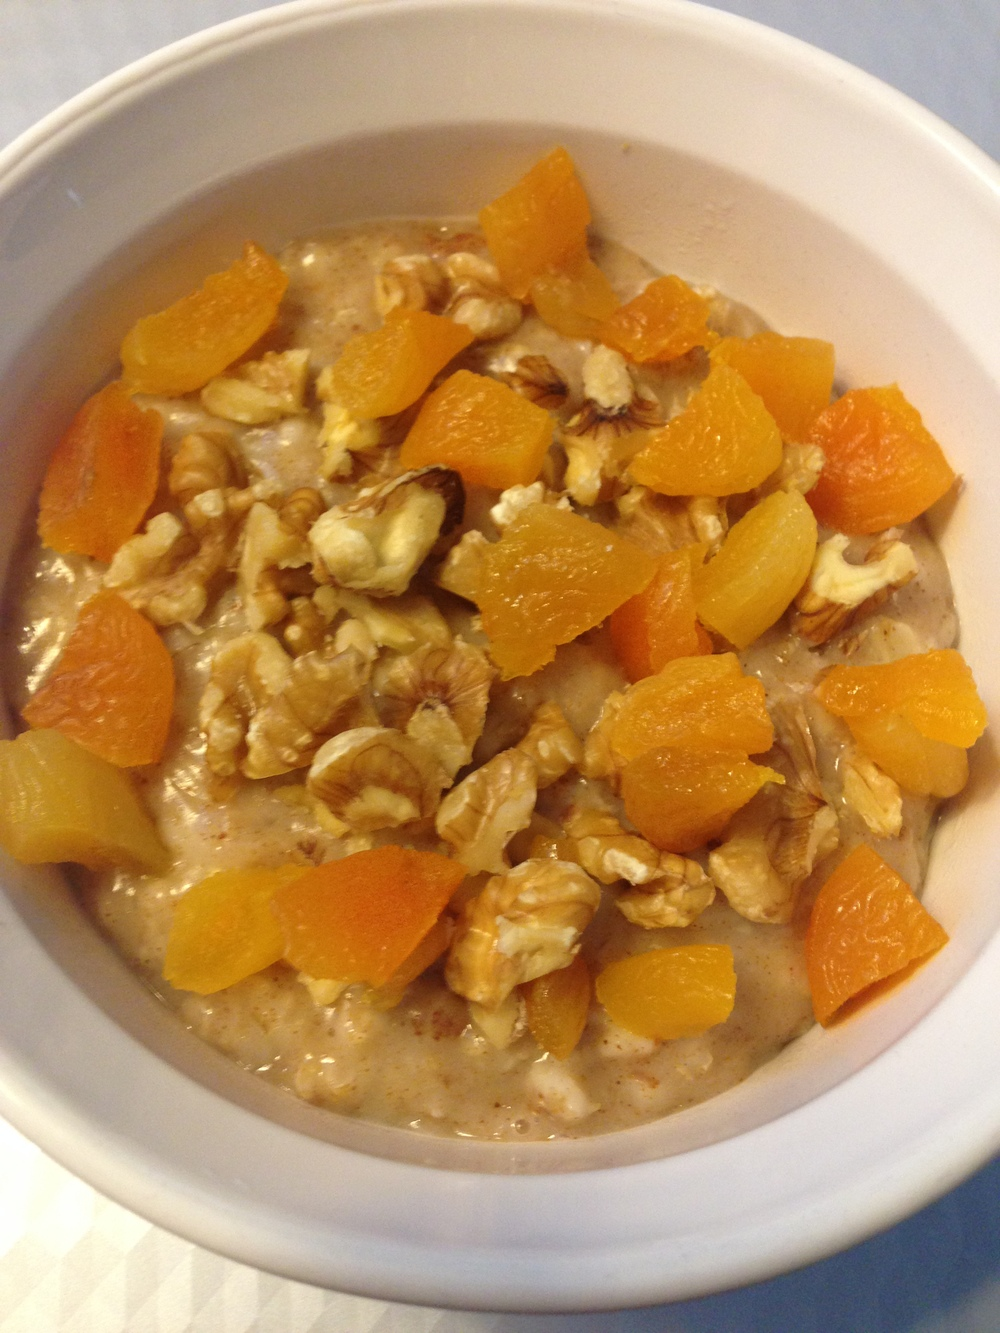 Cinnamon, Walnut, Apricot Oatmeal